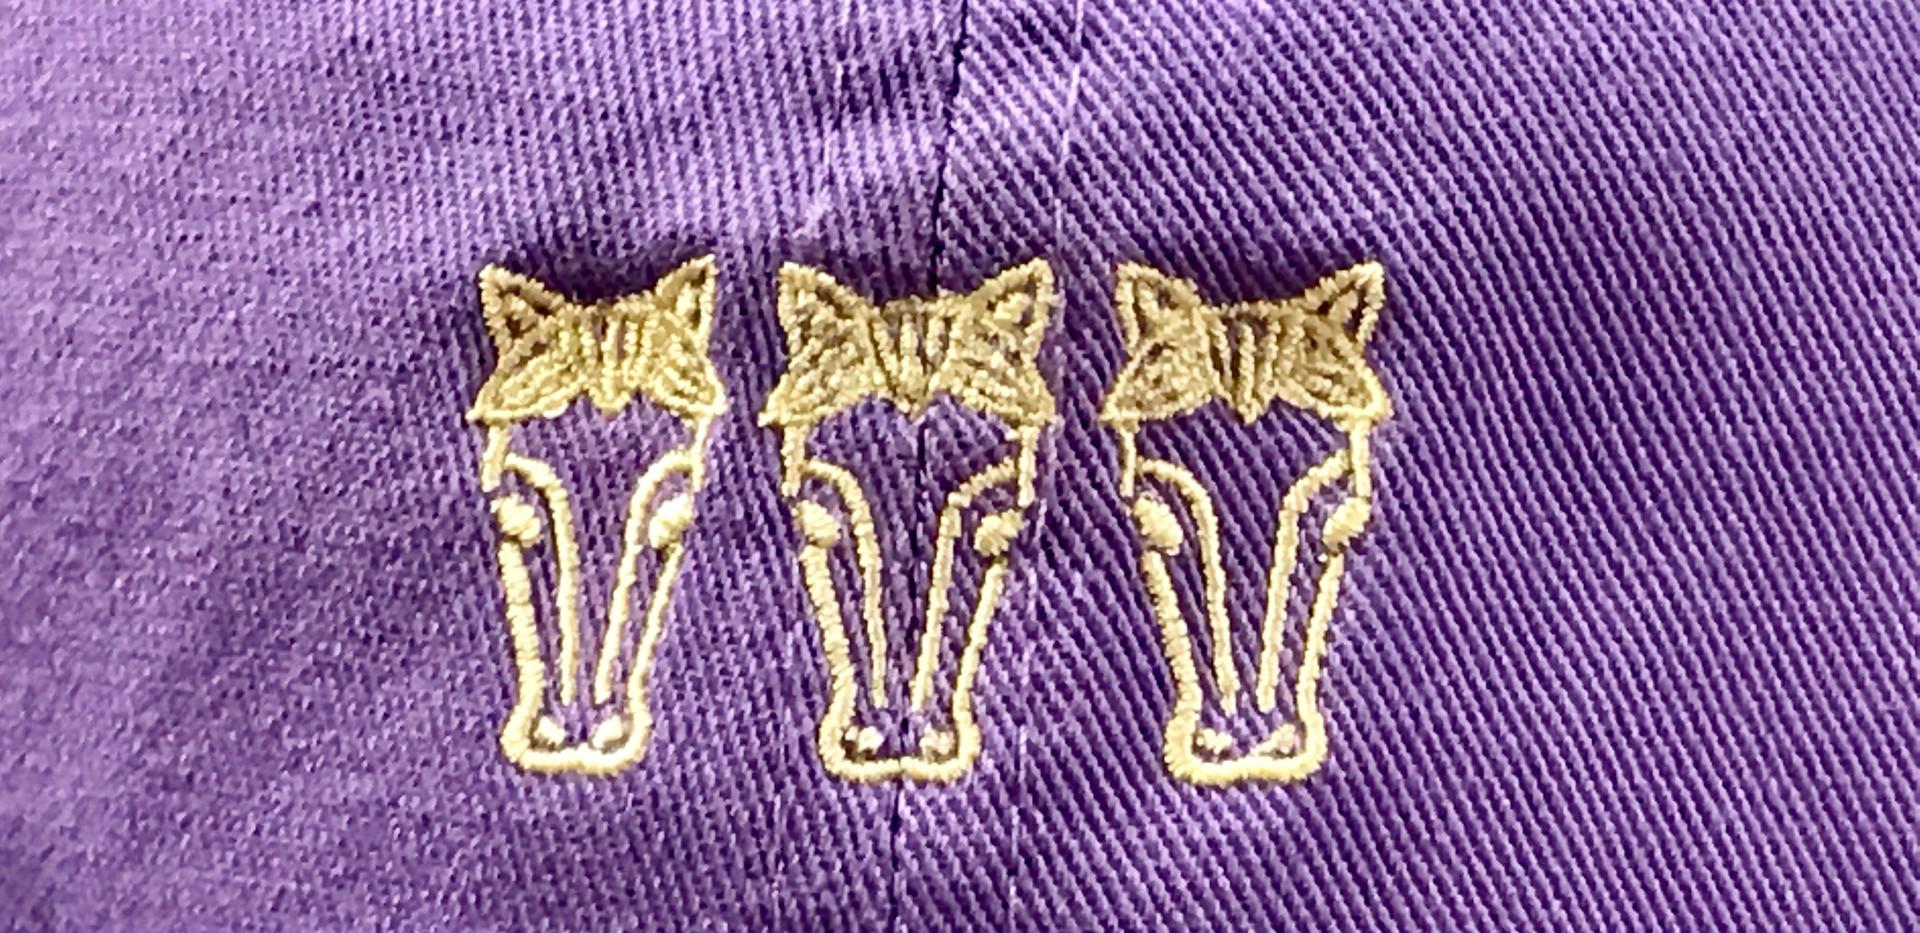 Shioya lavender